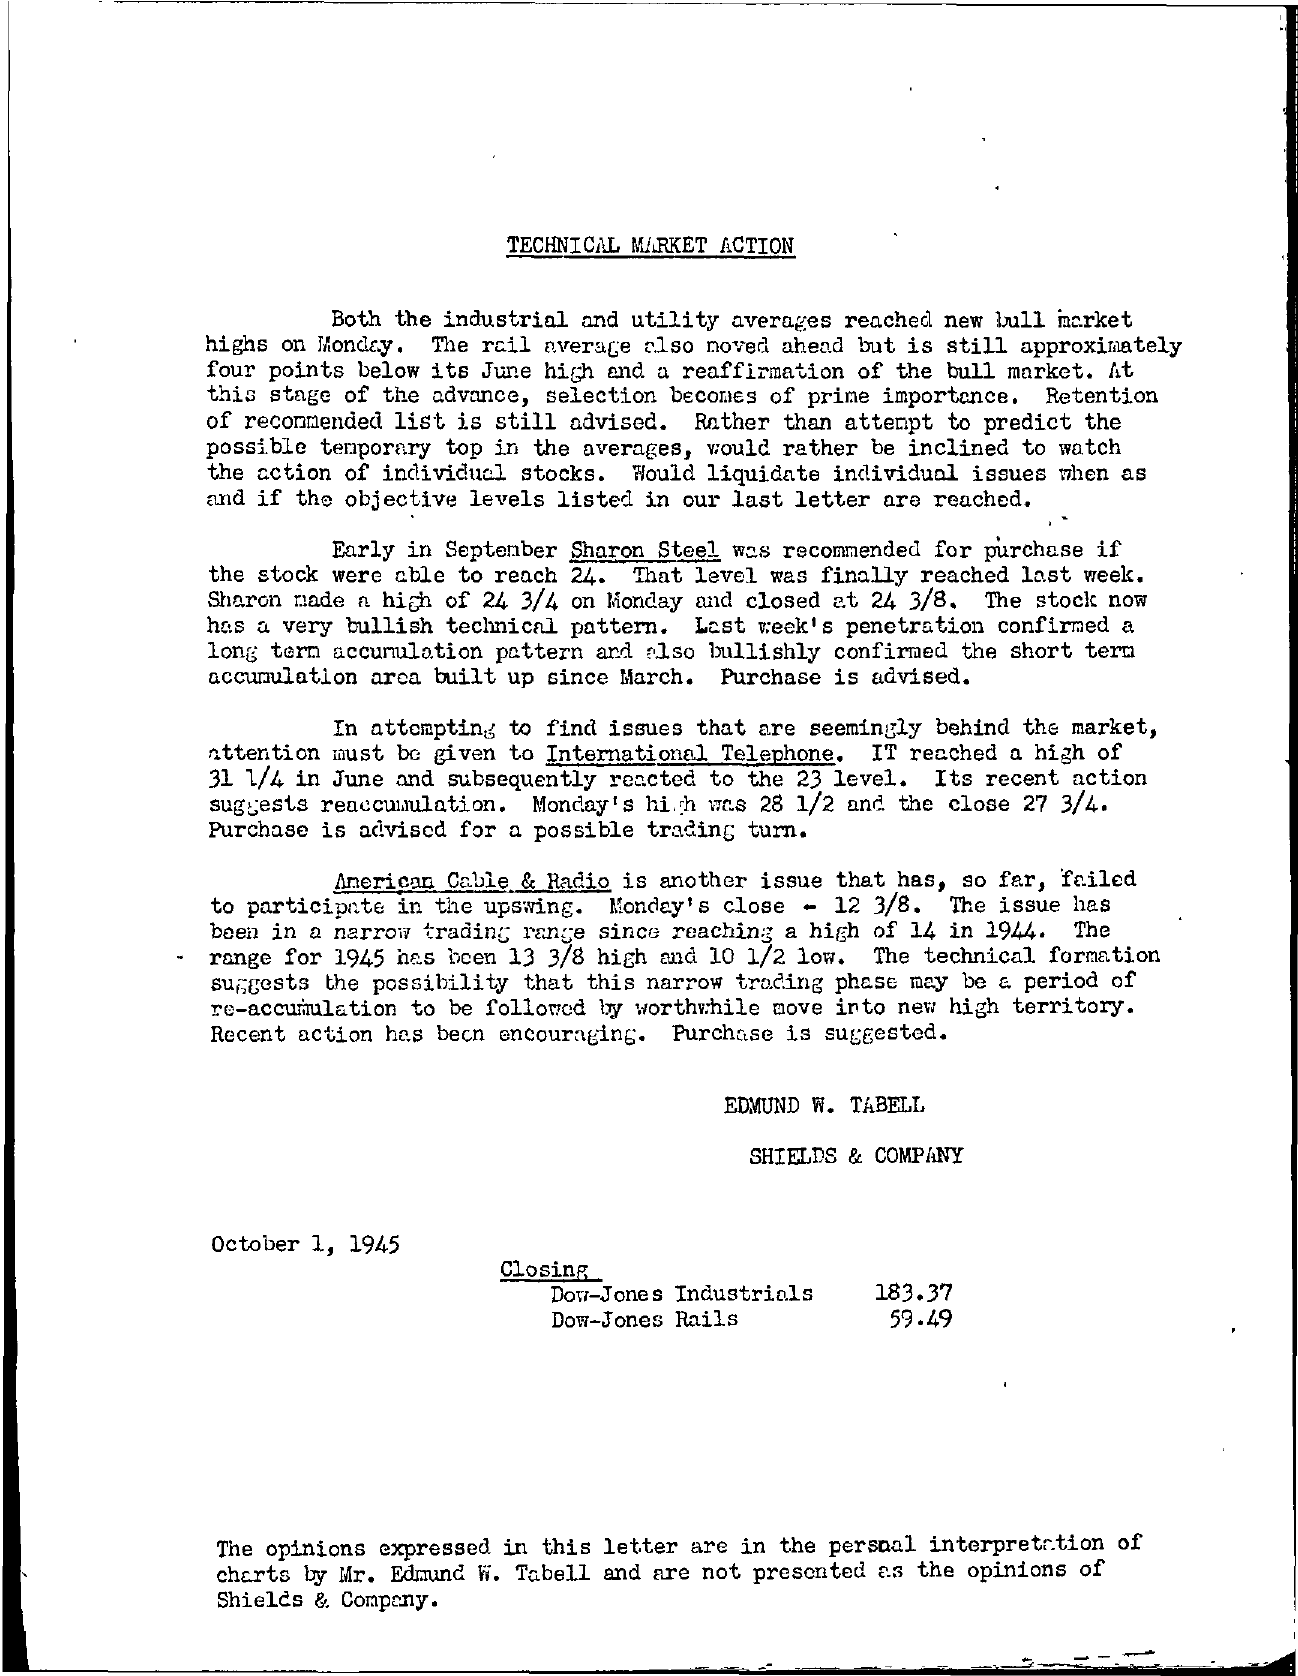 Tabell's Market Letter - October 01, 1945